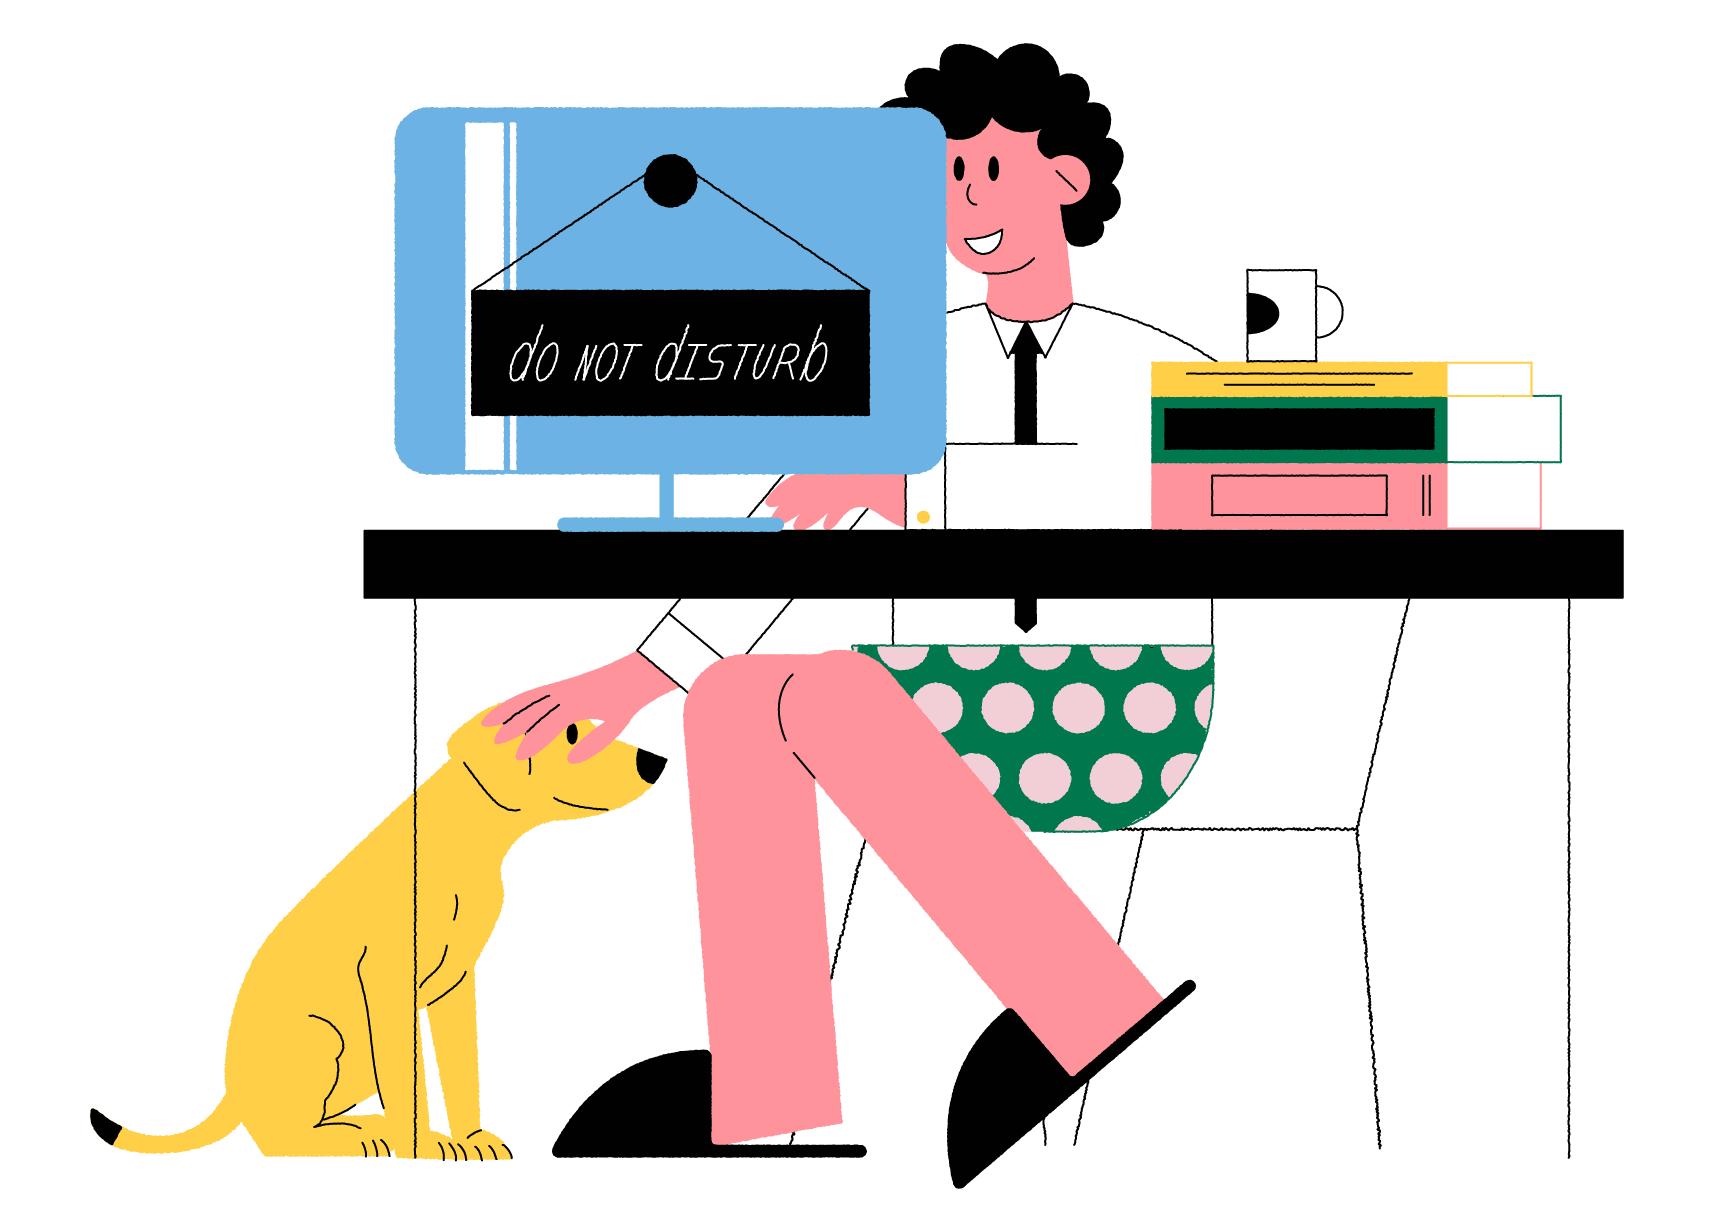 How to maintain work/life balance